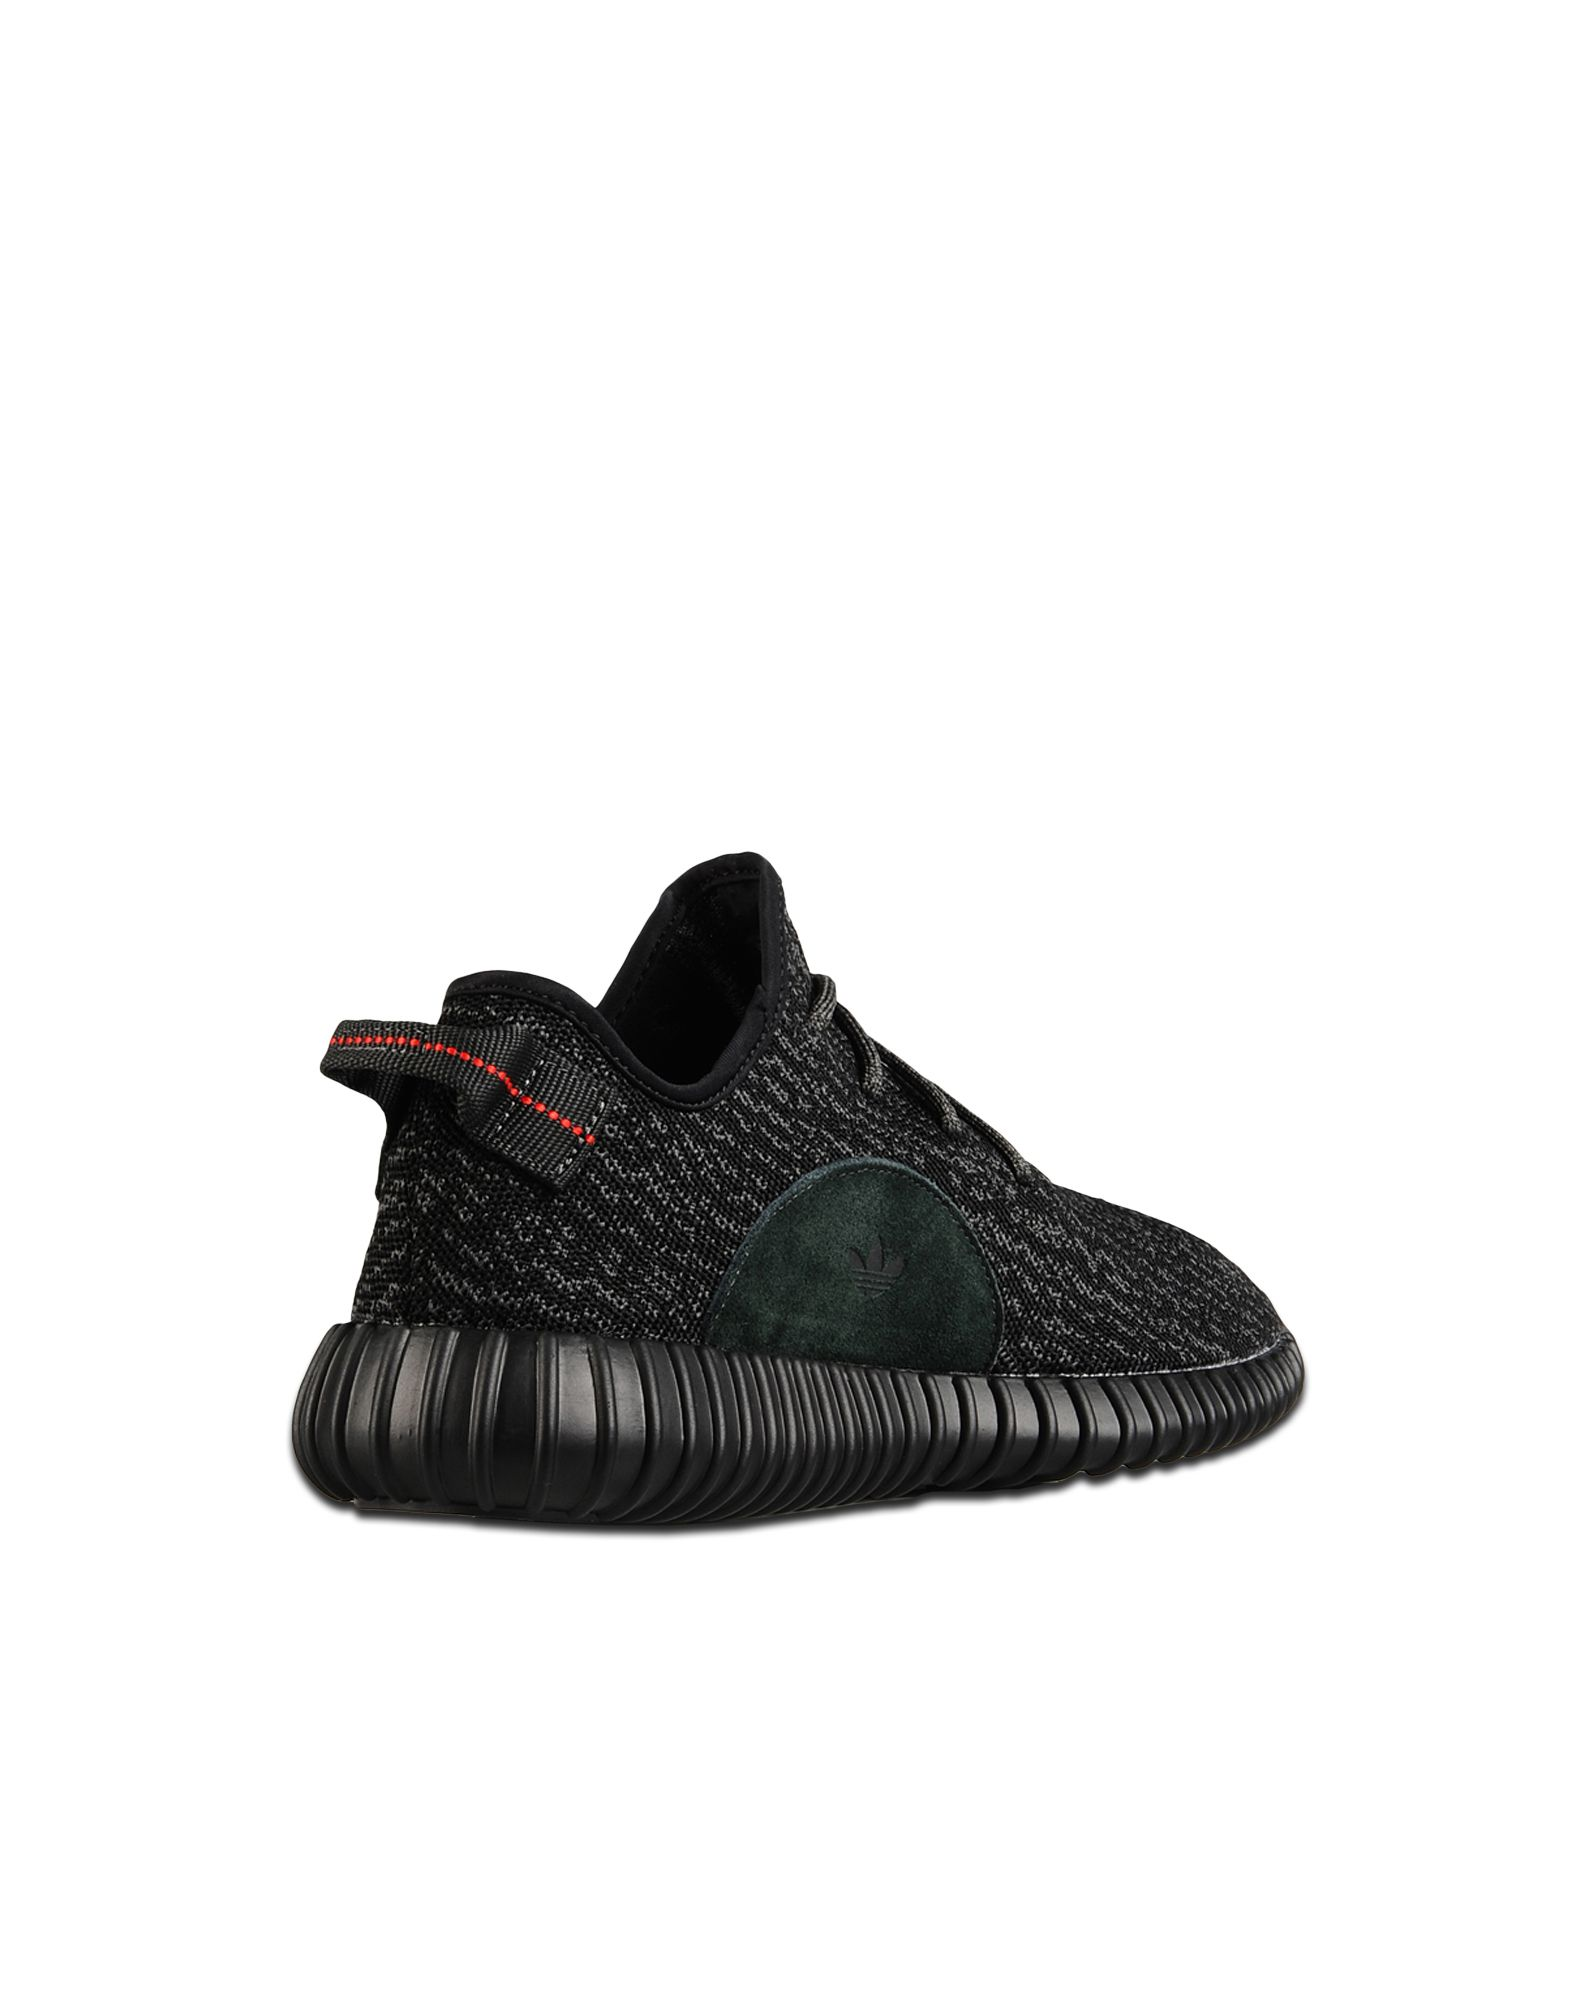 2a232bde0b0 ... v2 beluga ead1a a790e  discount adidas x kanye west yeezy boost 350  sneakers man cf445 b284a